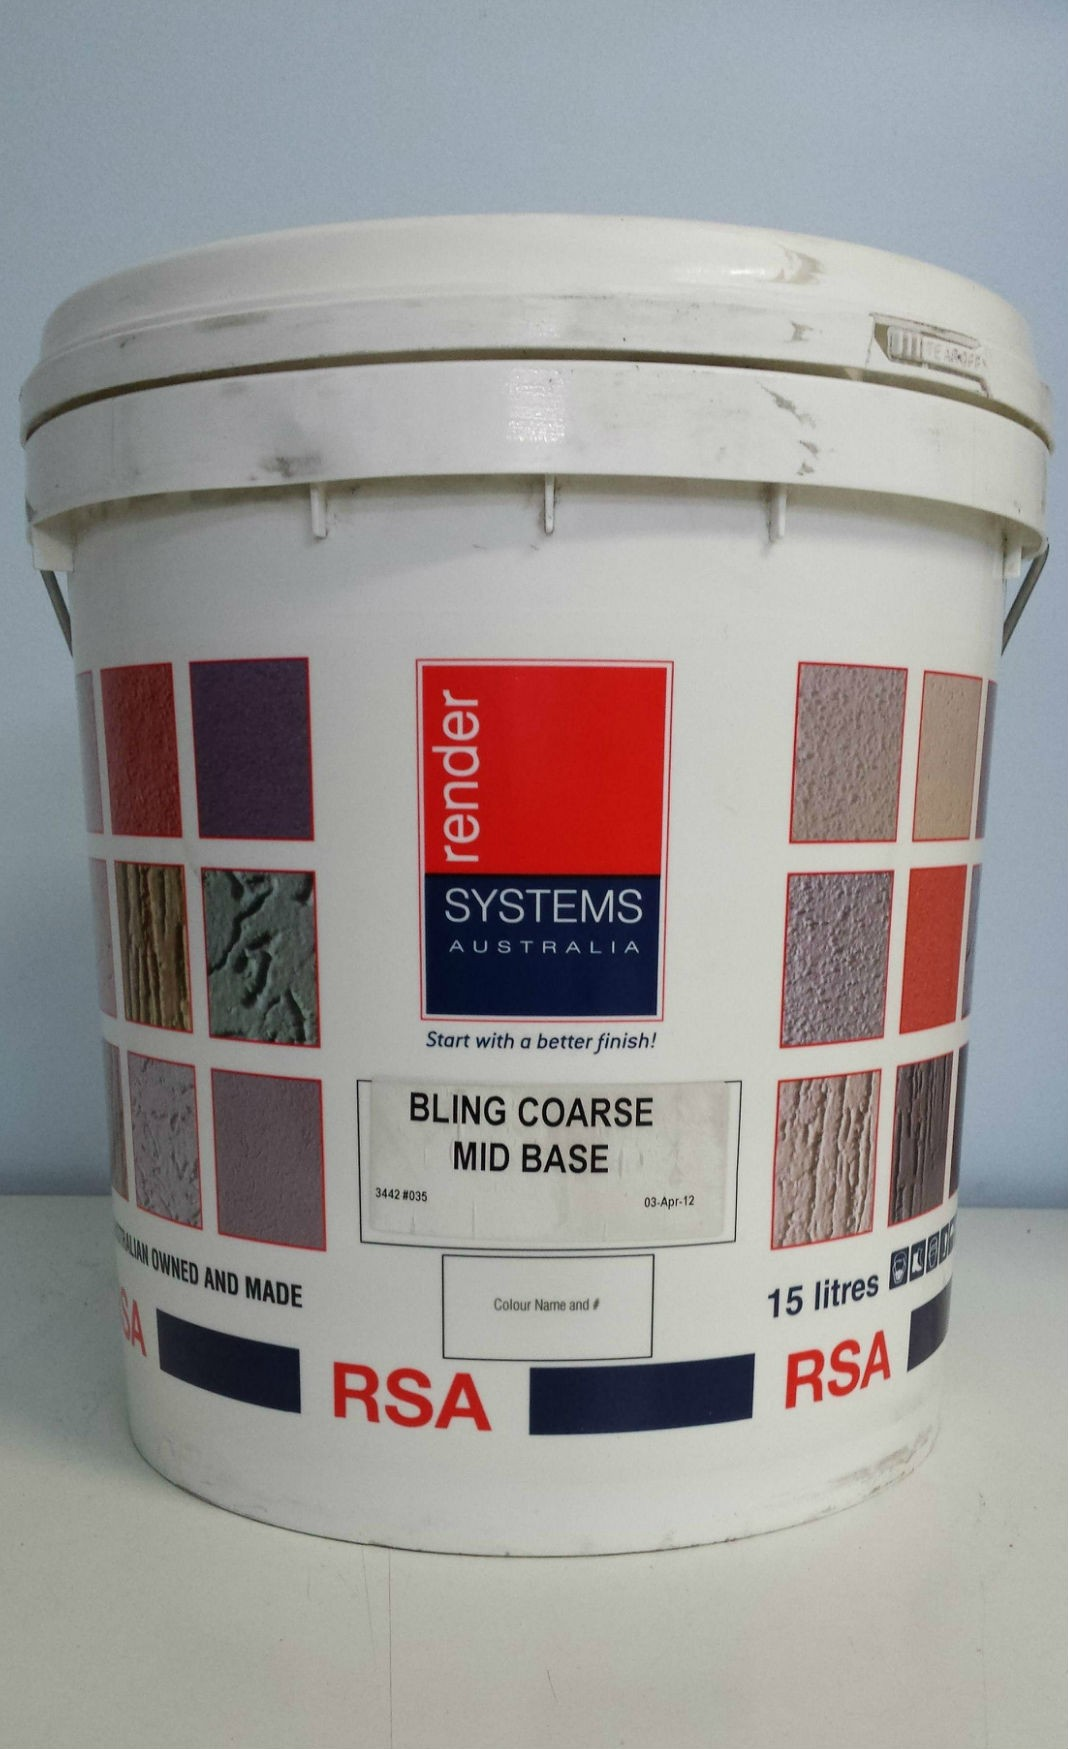 RSA Bling Coarse